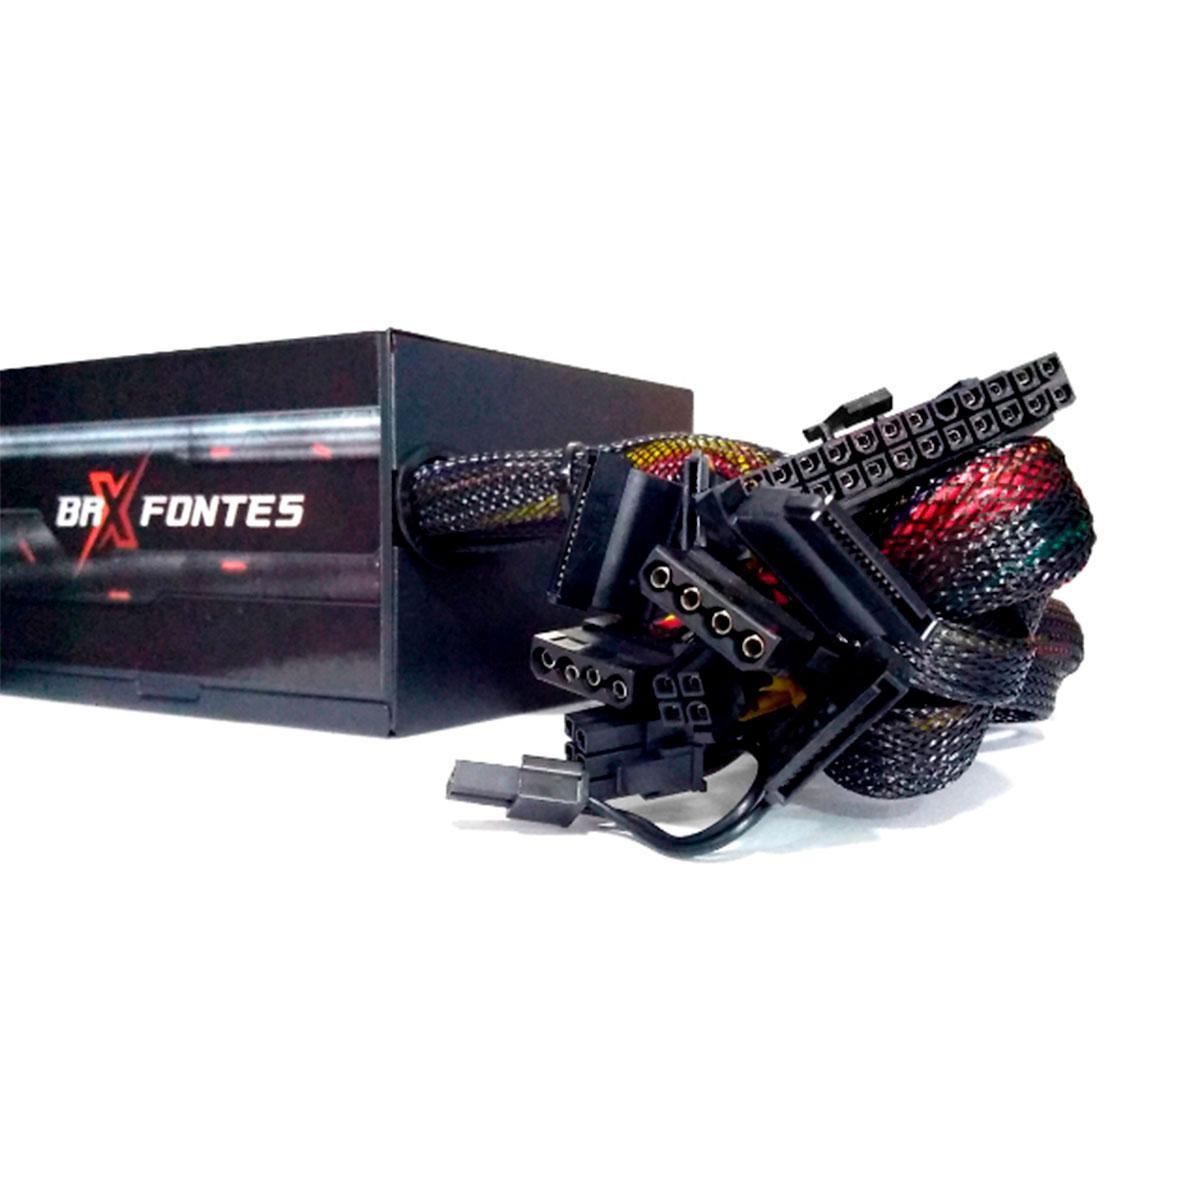 Fonte Gamer ATX BRX B-S850W, 850W Real, Cooler120mm, Bivolt Chaveada